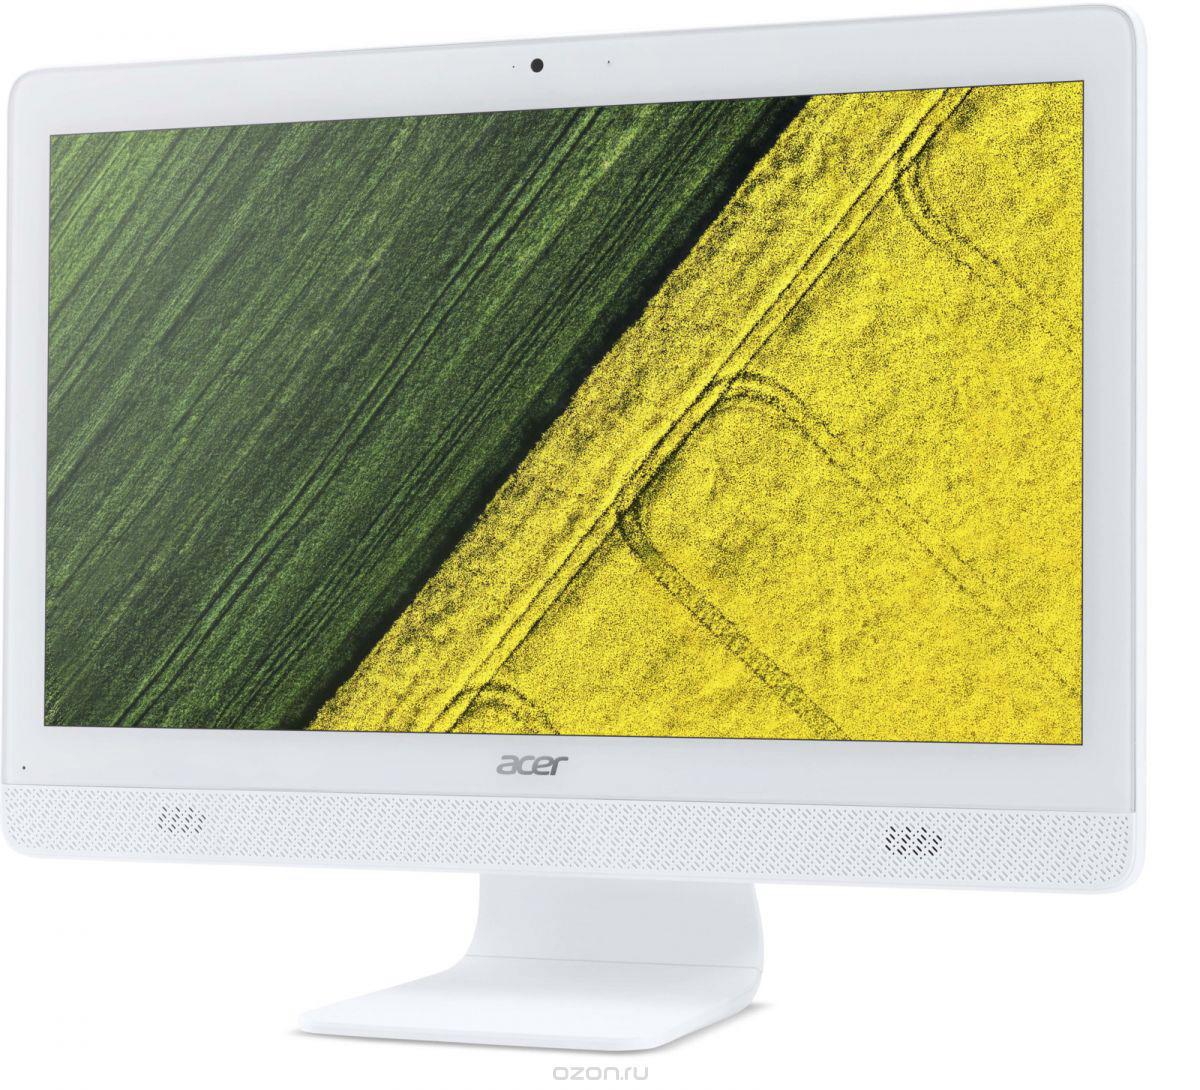 цена на 19.5 Моноблок Acer Aspire C20-820 (DQ.BC6ER.005), белый